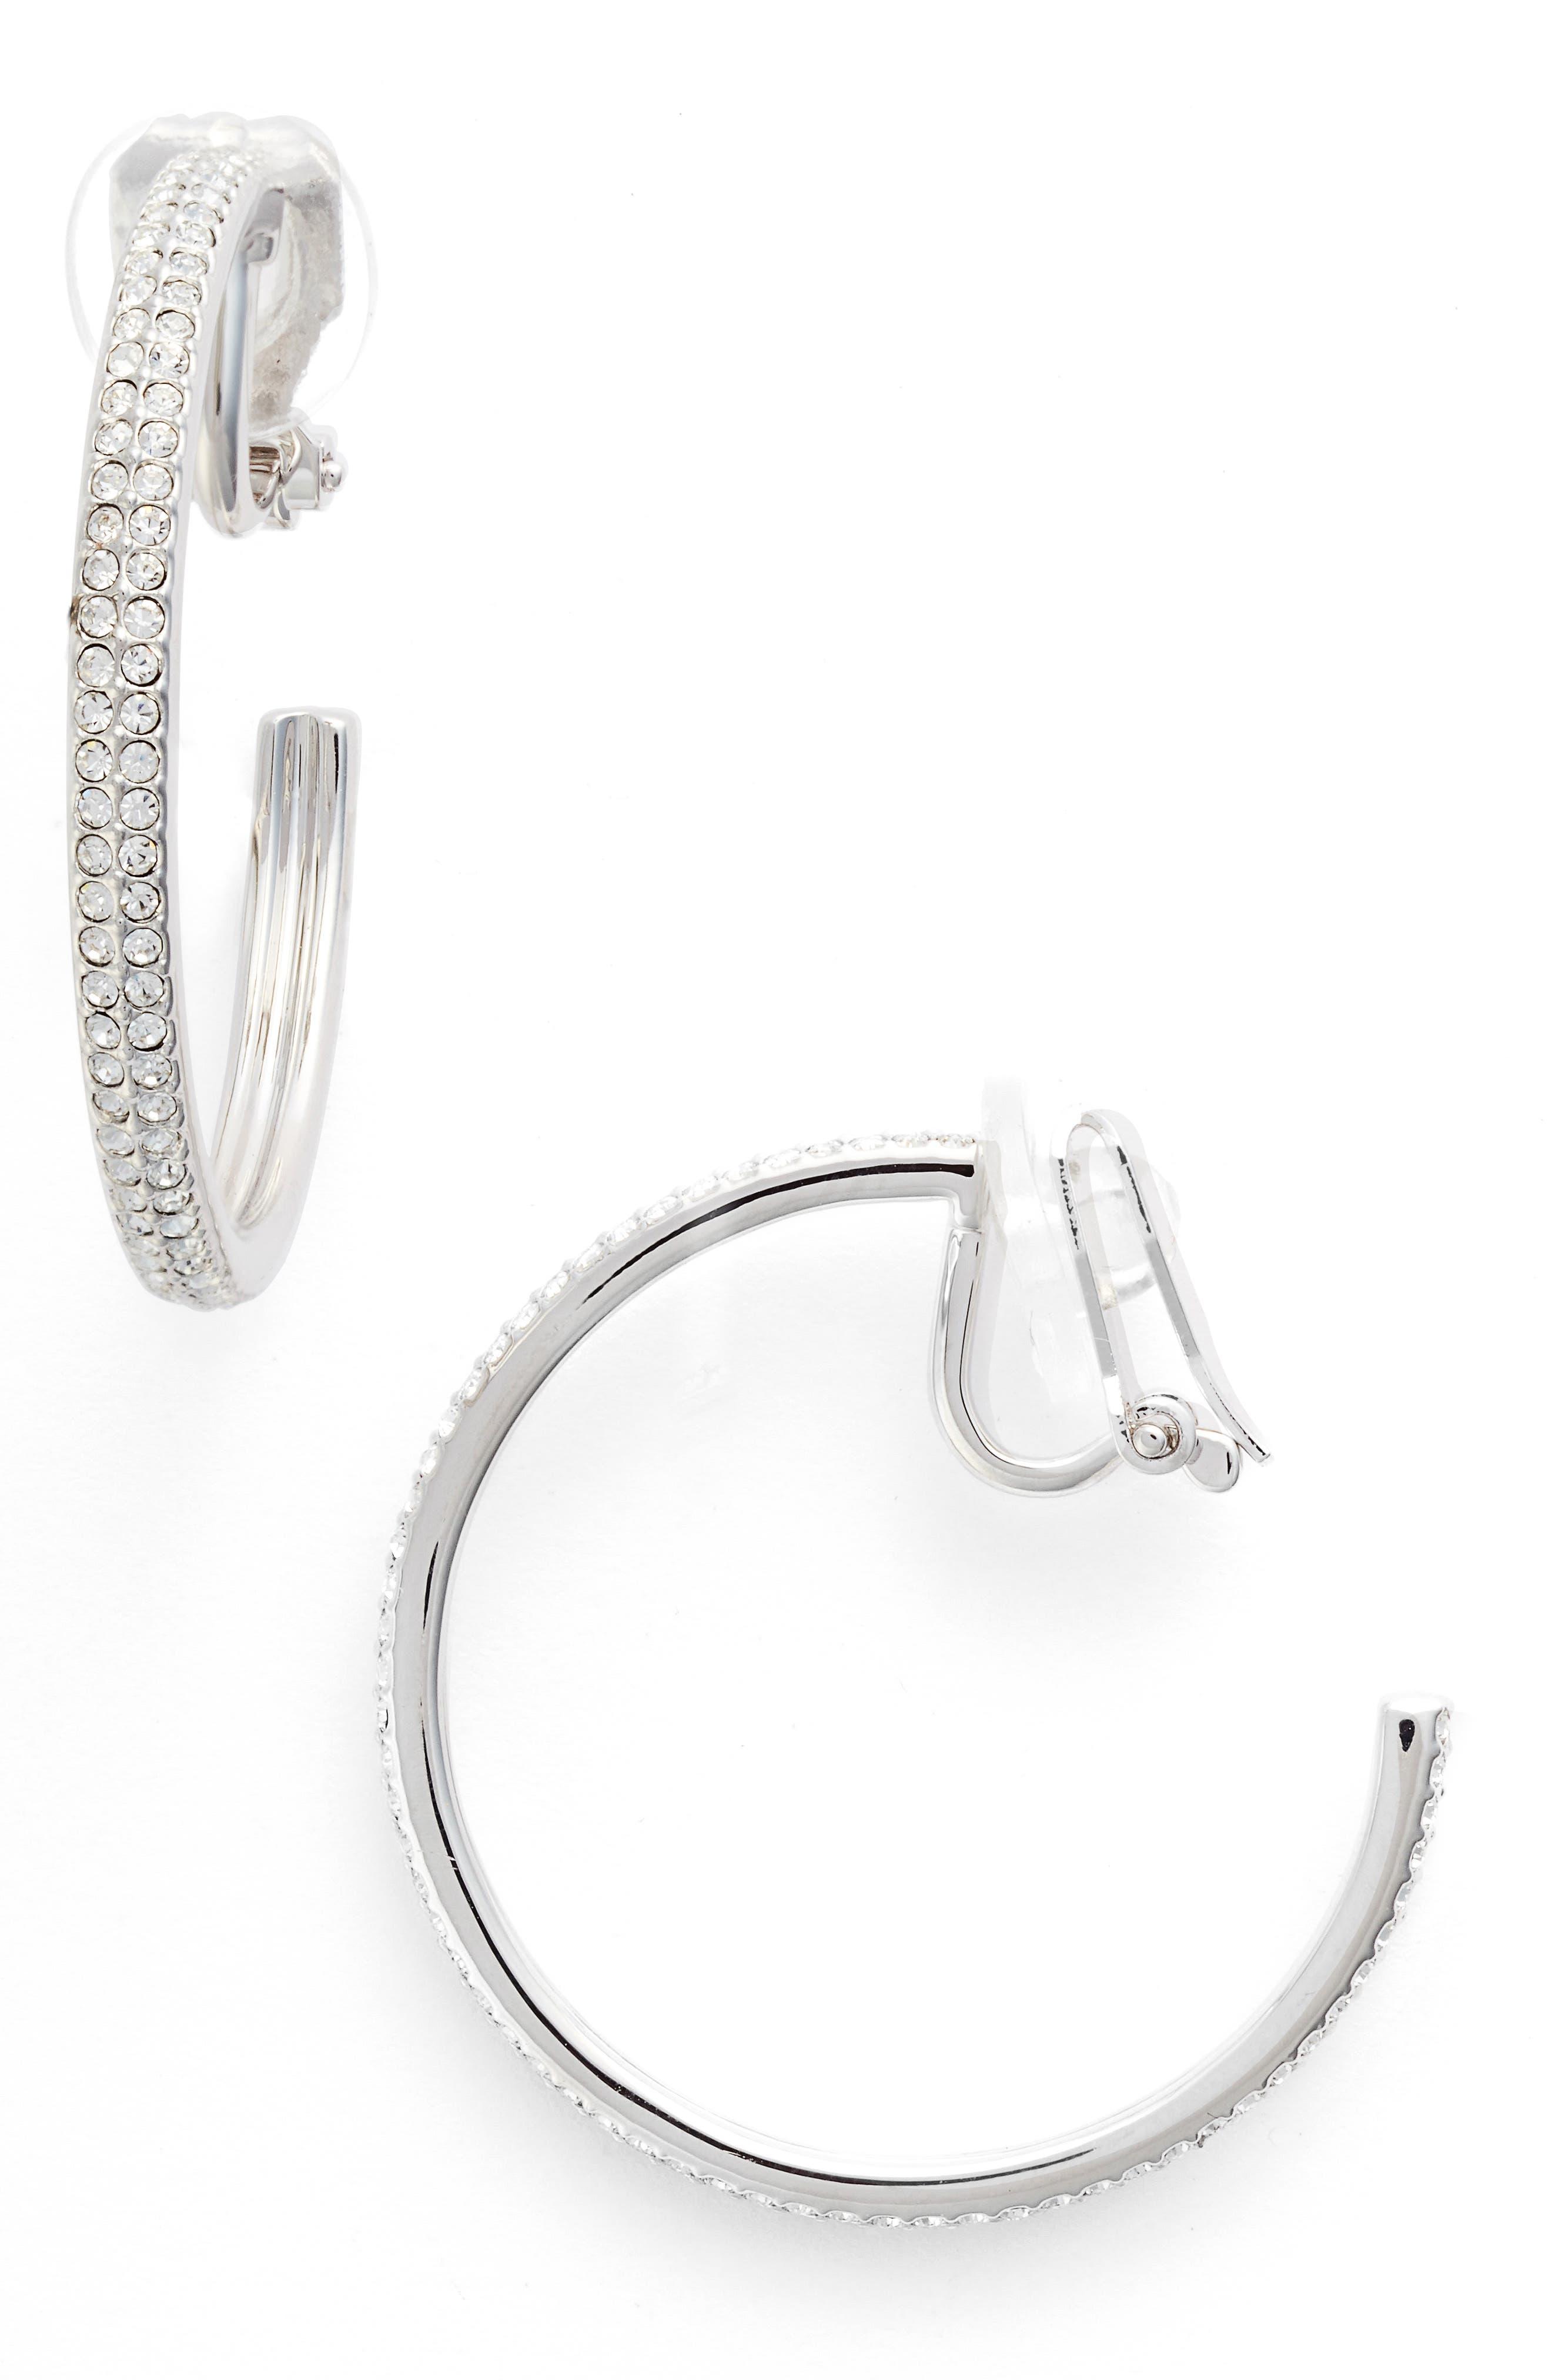 Clip-On Hoop Earrings,                             Main thumbnail 1, color,                             SILVER